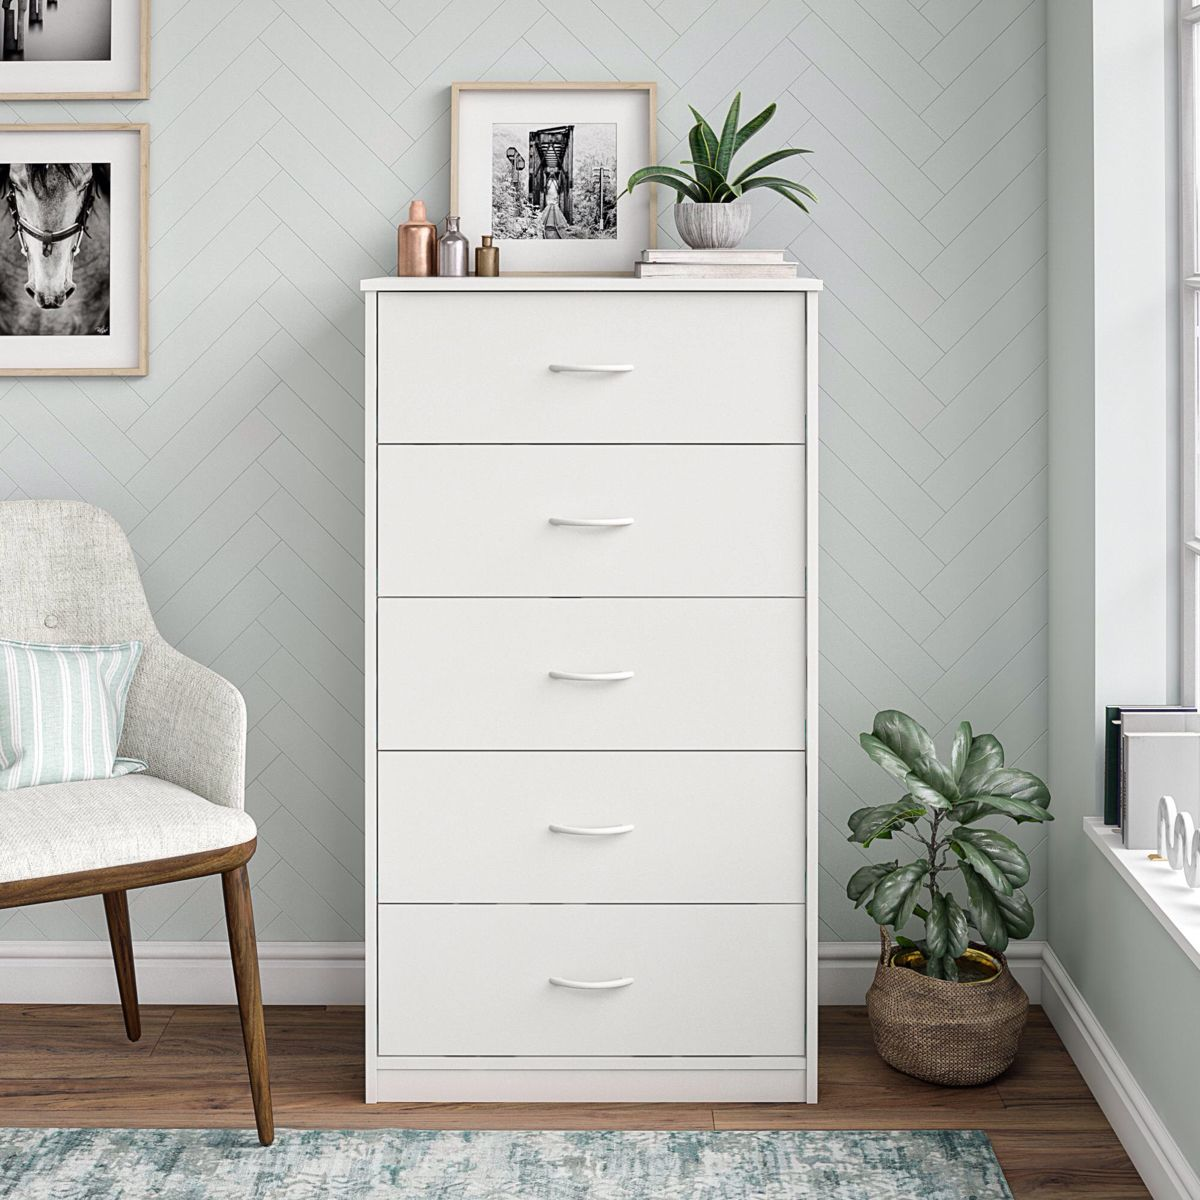 Mainstays Classic 5 Drawer Dresser White Finish Walmart Com Dresser Decor Bedroom White Dresser Decor Room Ideas Bedroom [ 1200 x 1200 Pixel ]